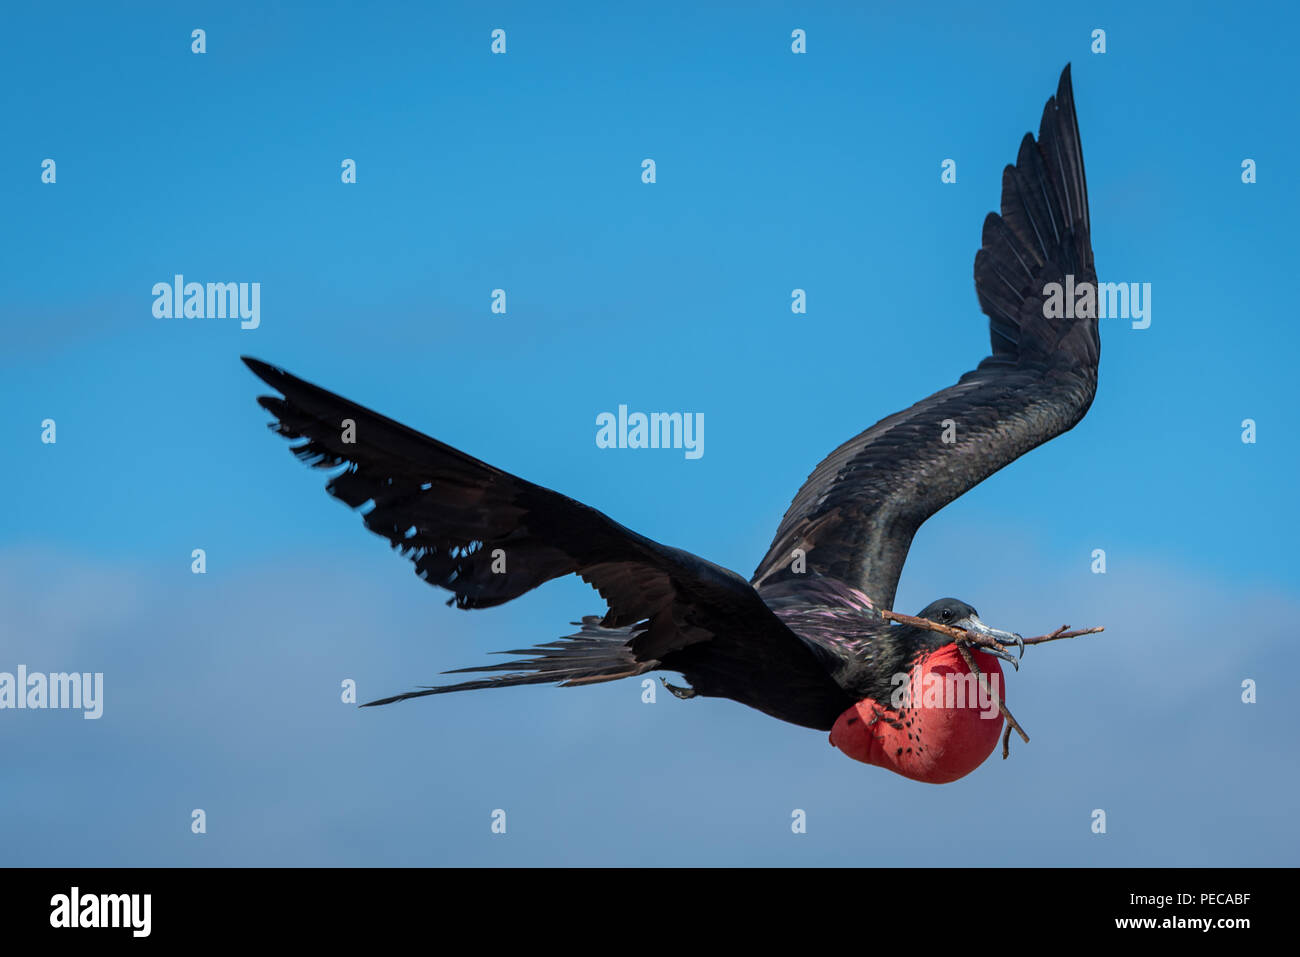 Prachtvolle Fregatte Vögel im Flug Stockbild